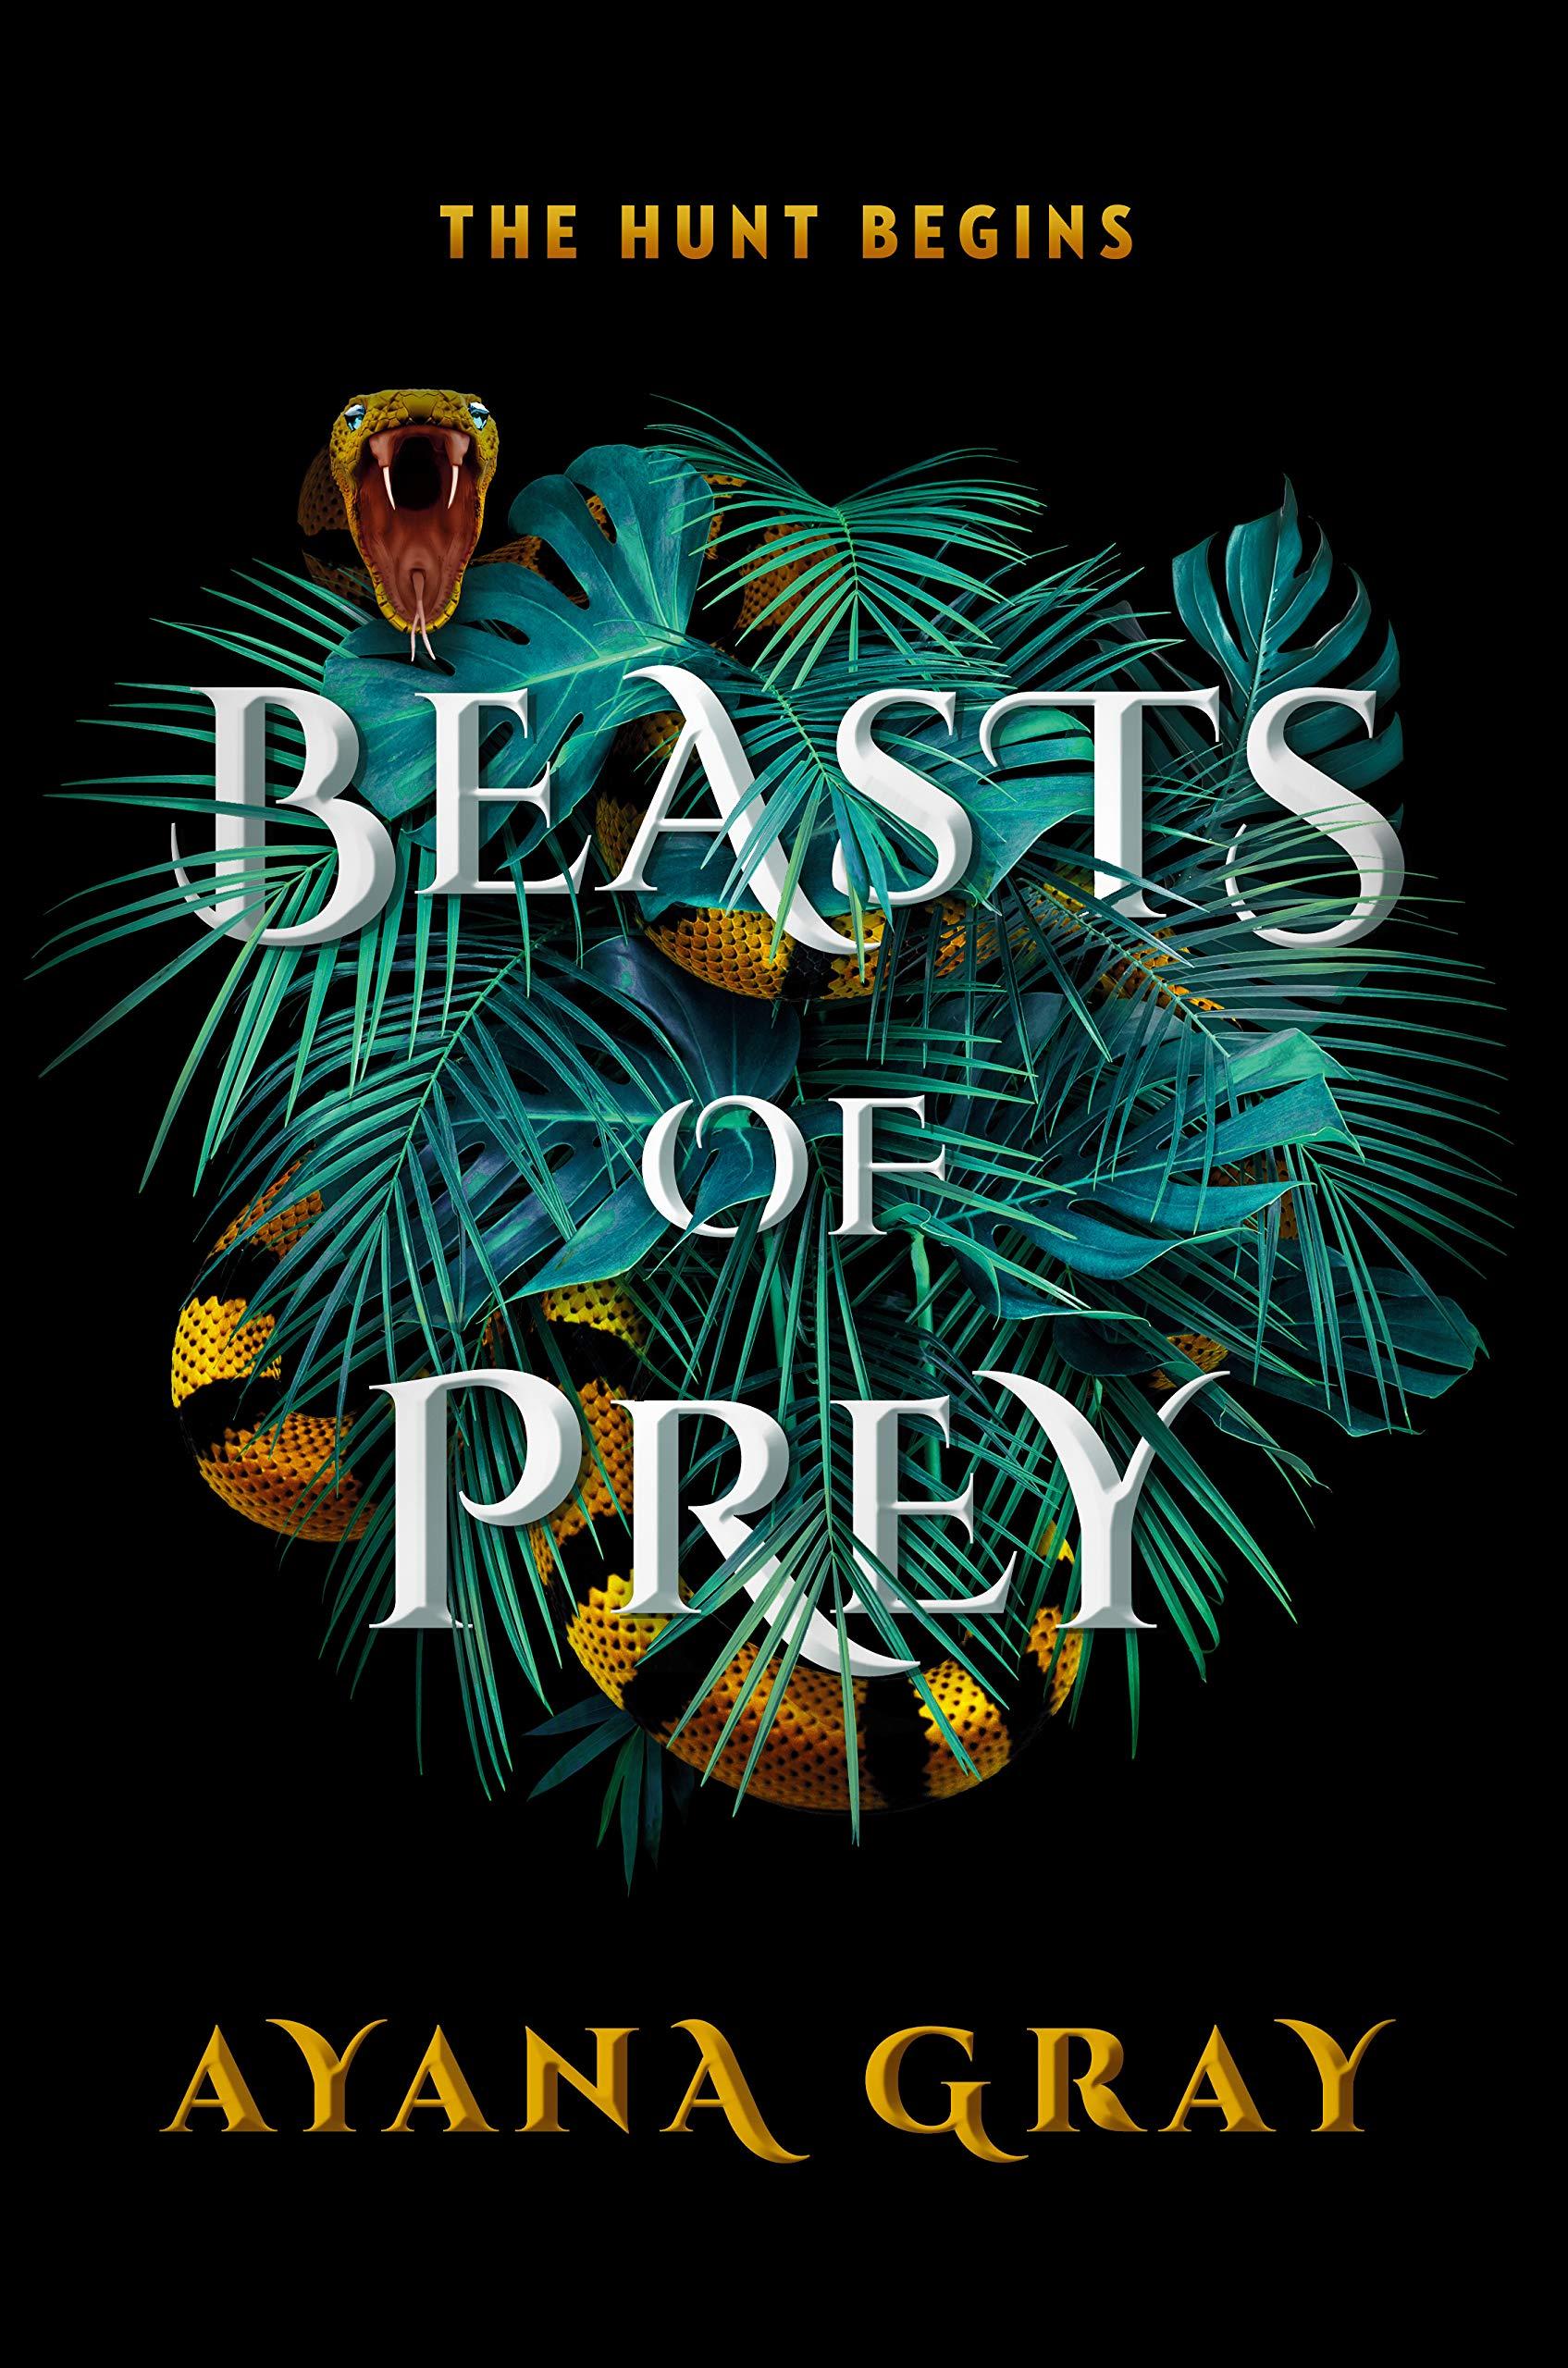 Amazon.com: Beasts of Prey (9780593405680): Gray, Ayana: Books